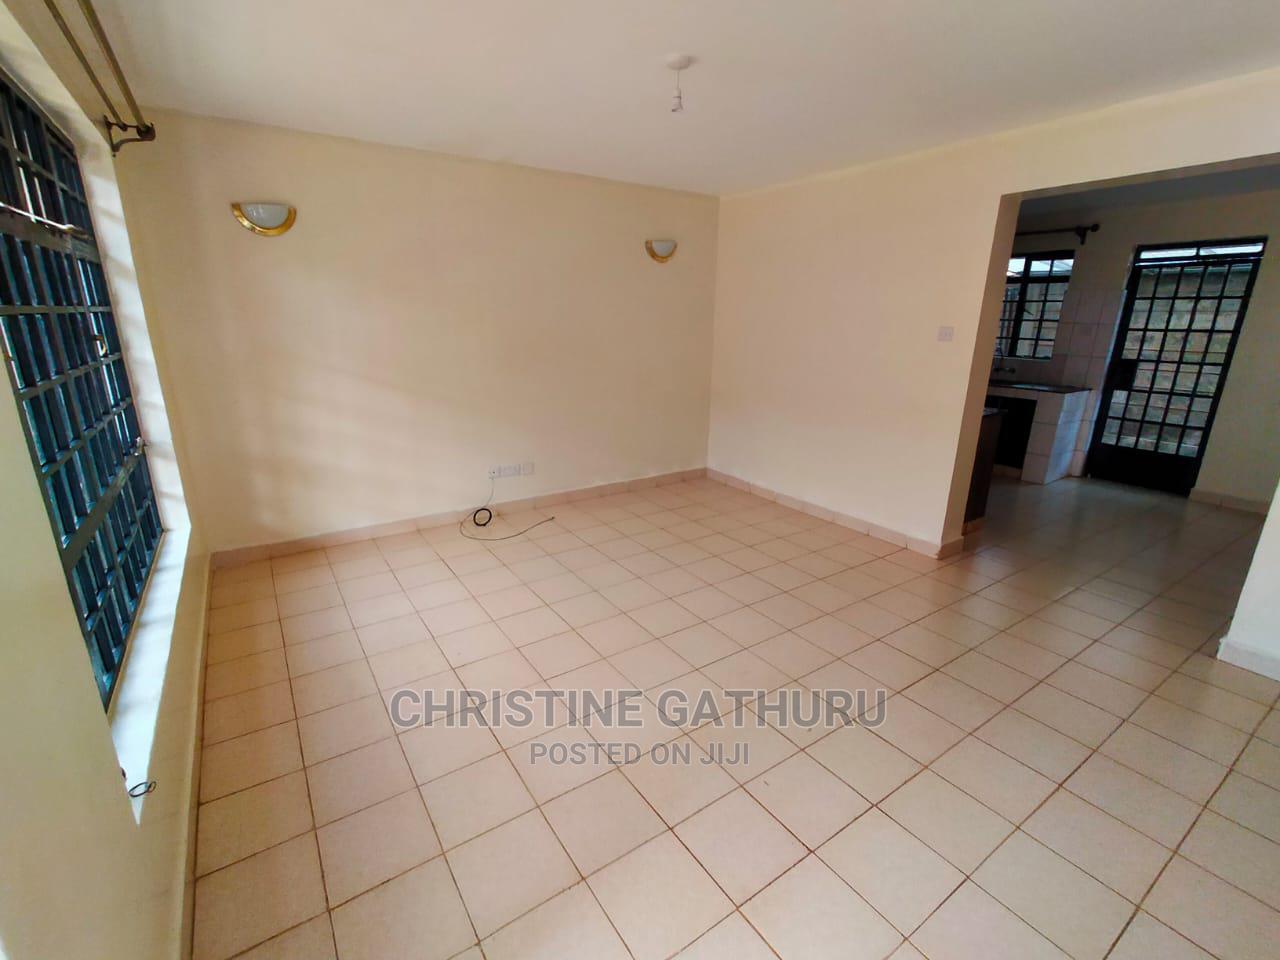 3 Bedroom House to Let in Thogoto | Houses & Apartments For Rent for sale in Kikuyu, Kiambu, Kenya